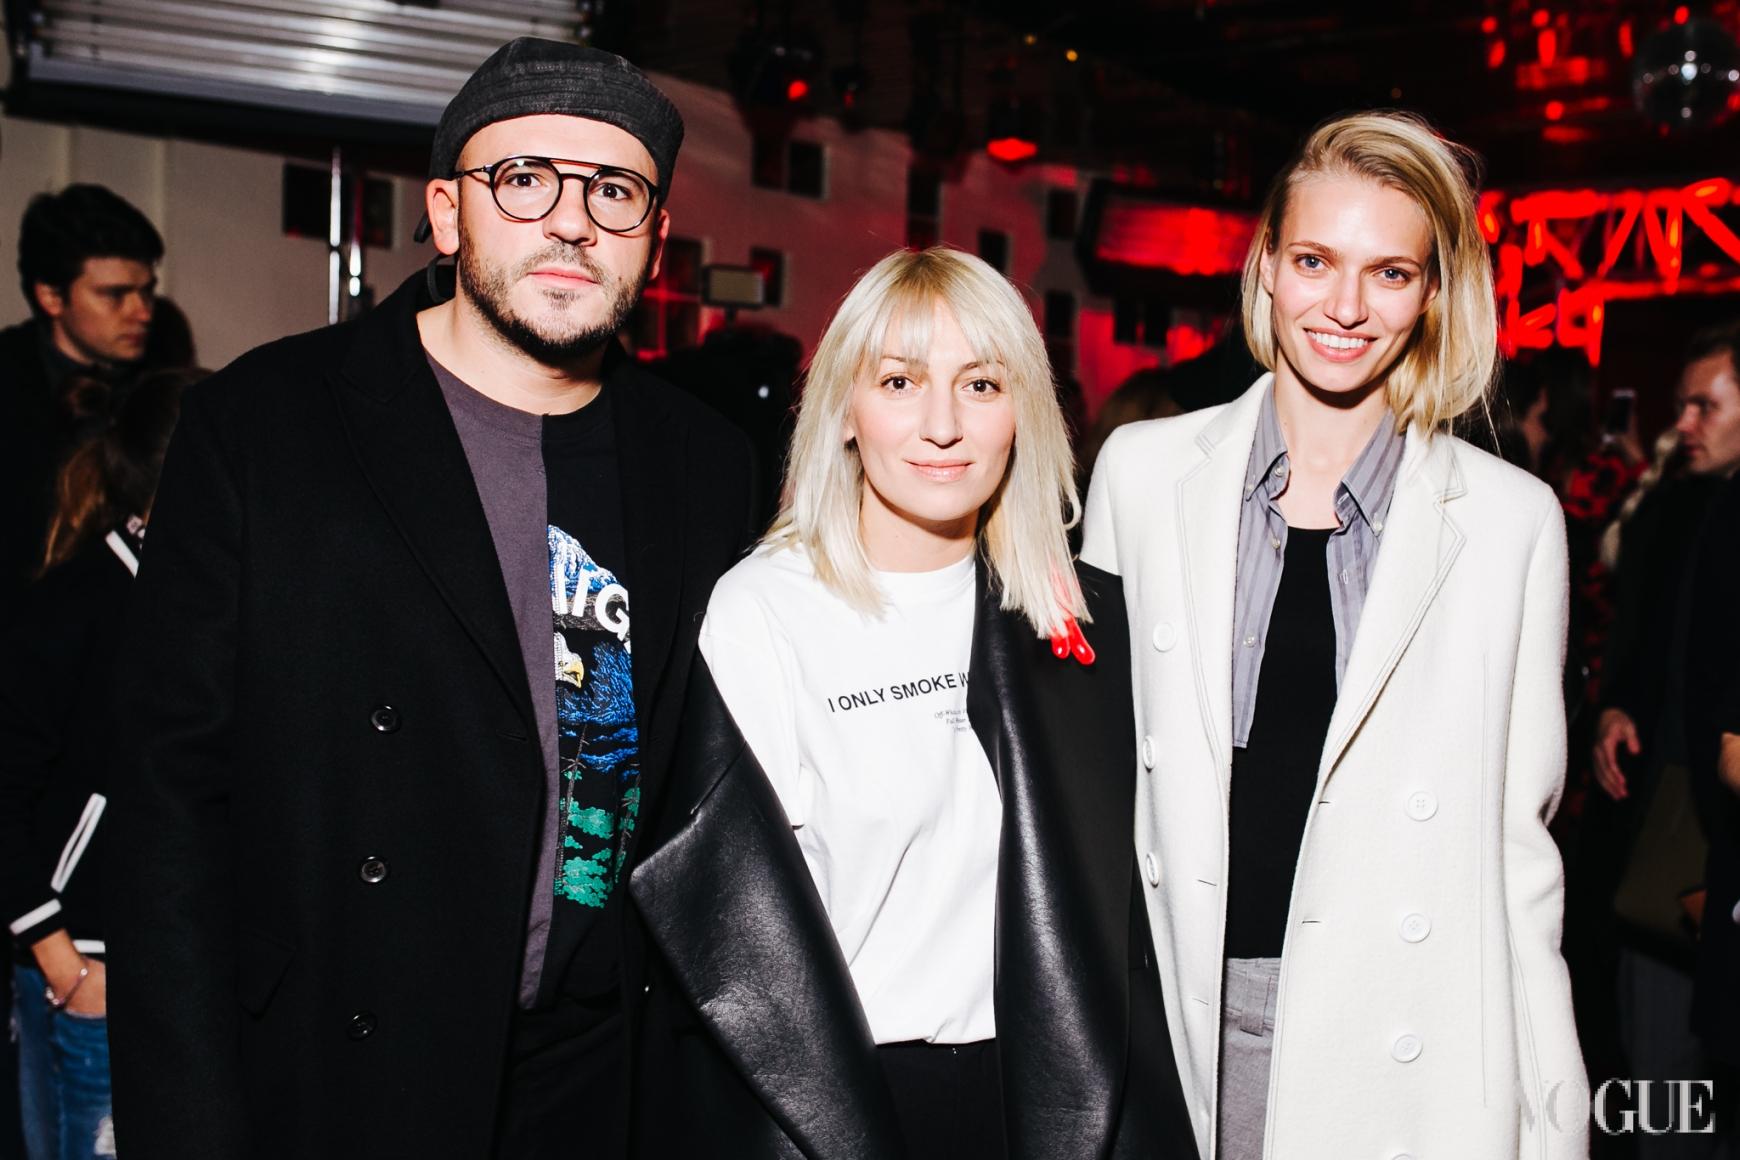 Дмитрий Евенко, Ася Мхитарян и Алена Киперман